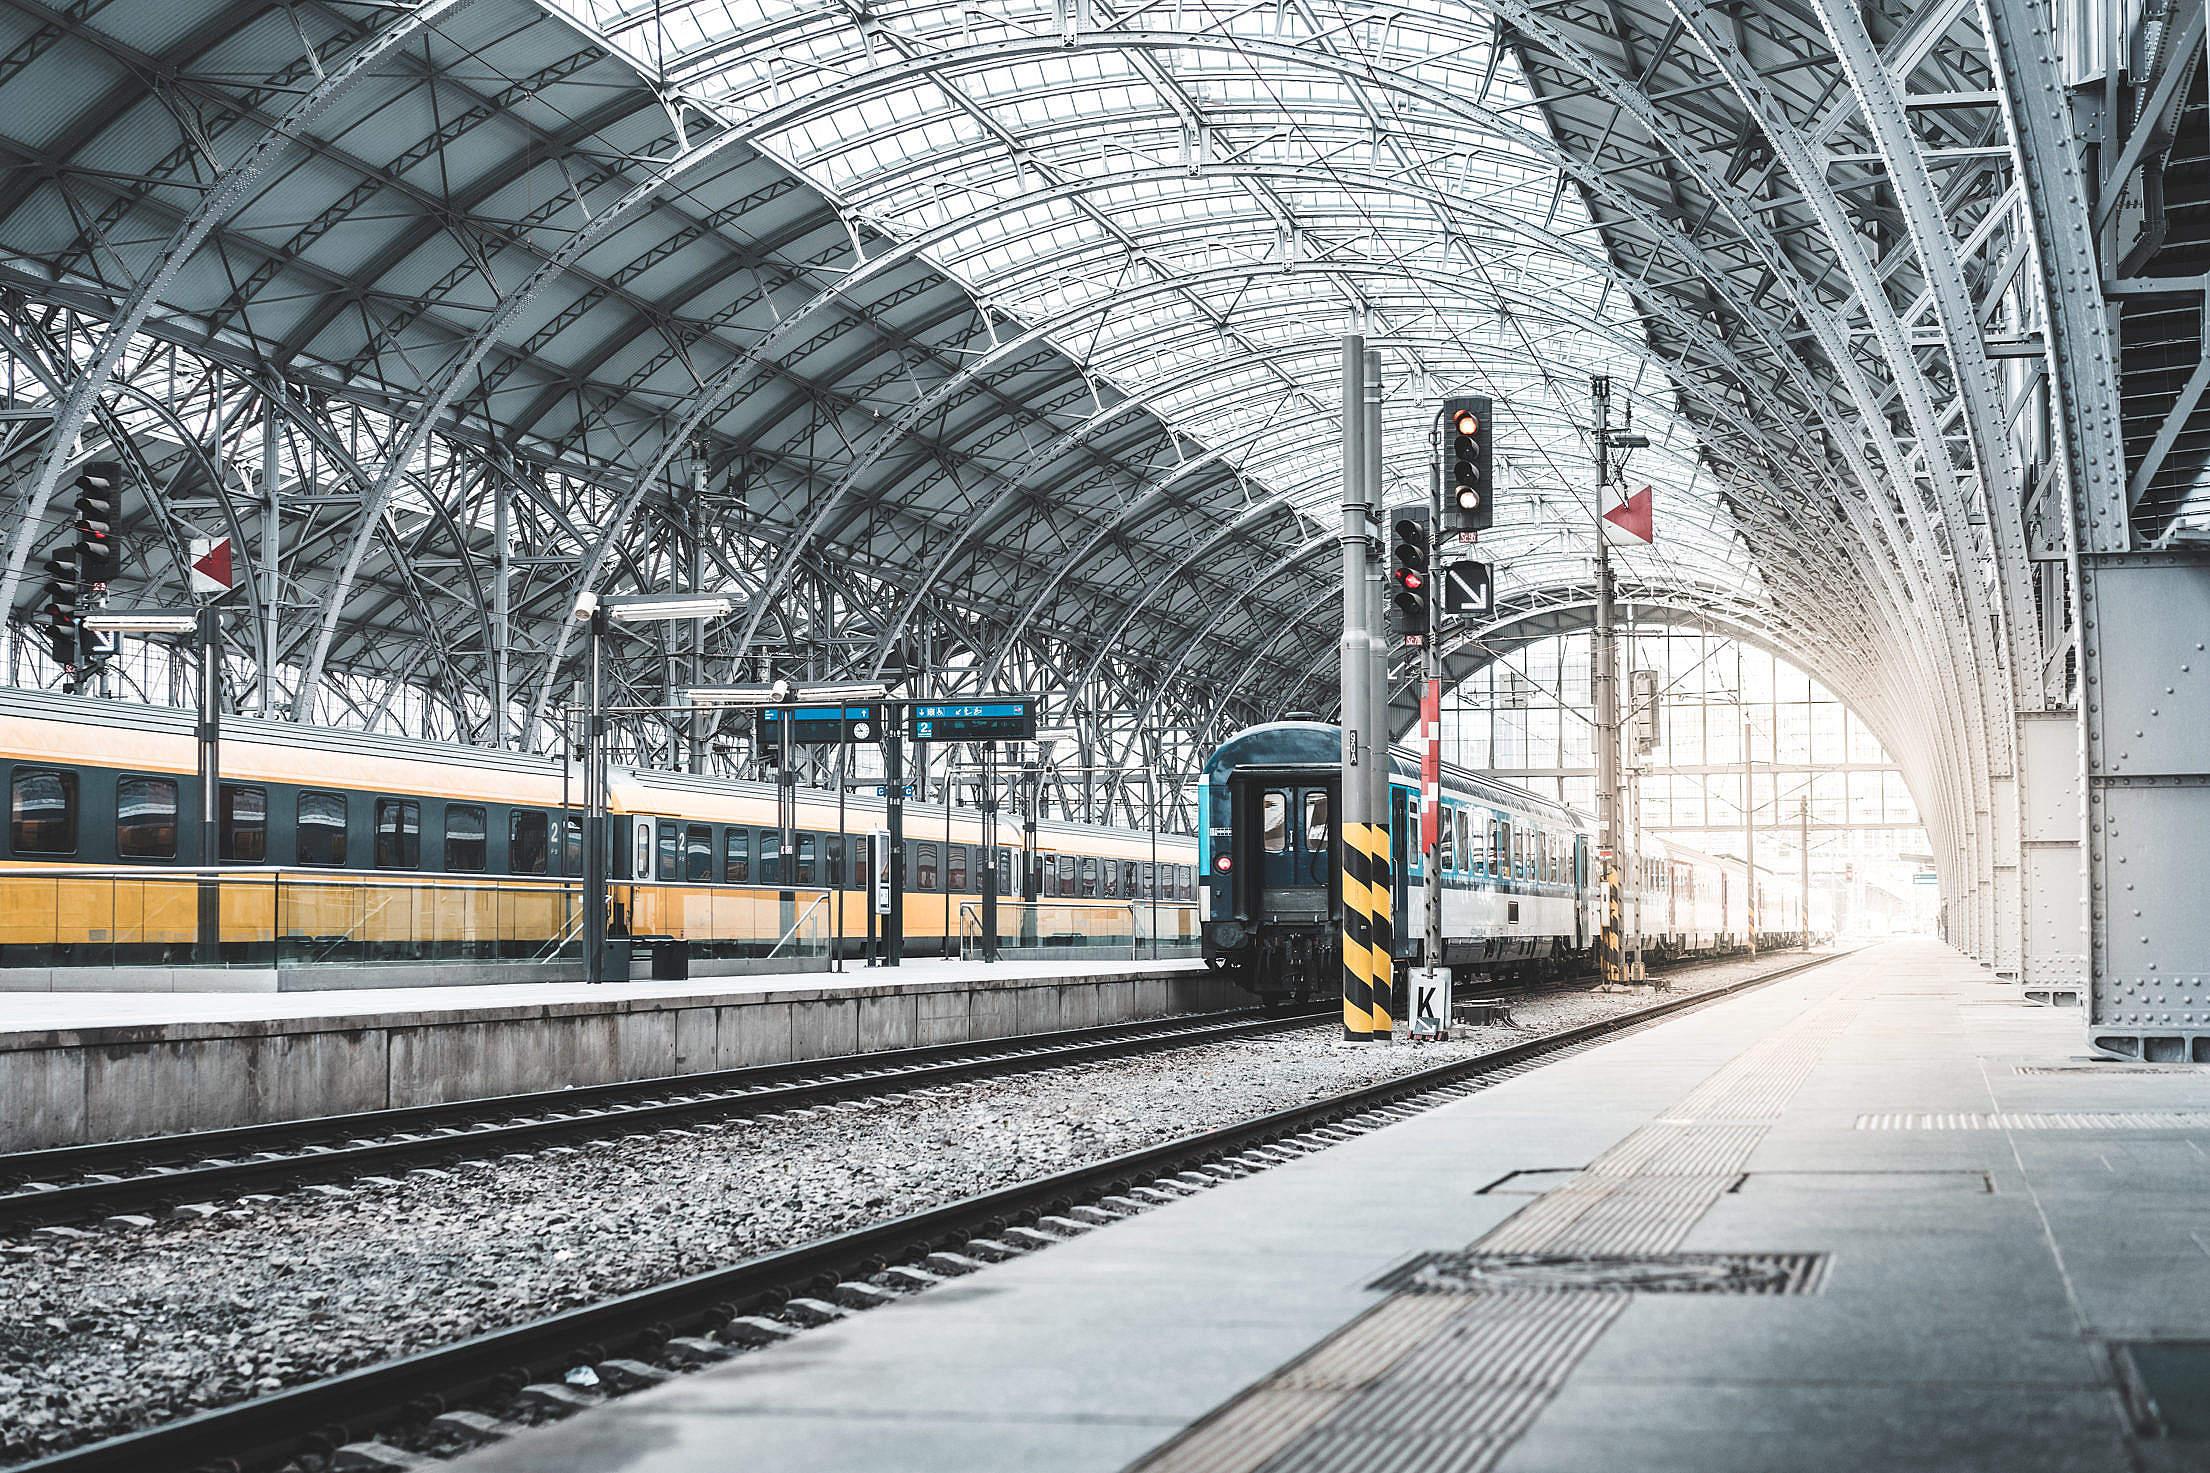 Old Railway Station Free Stock Photo